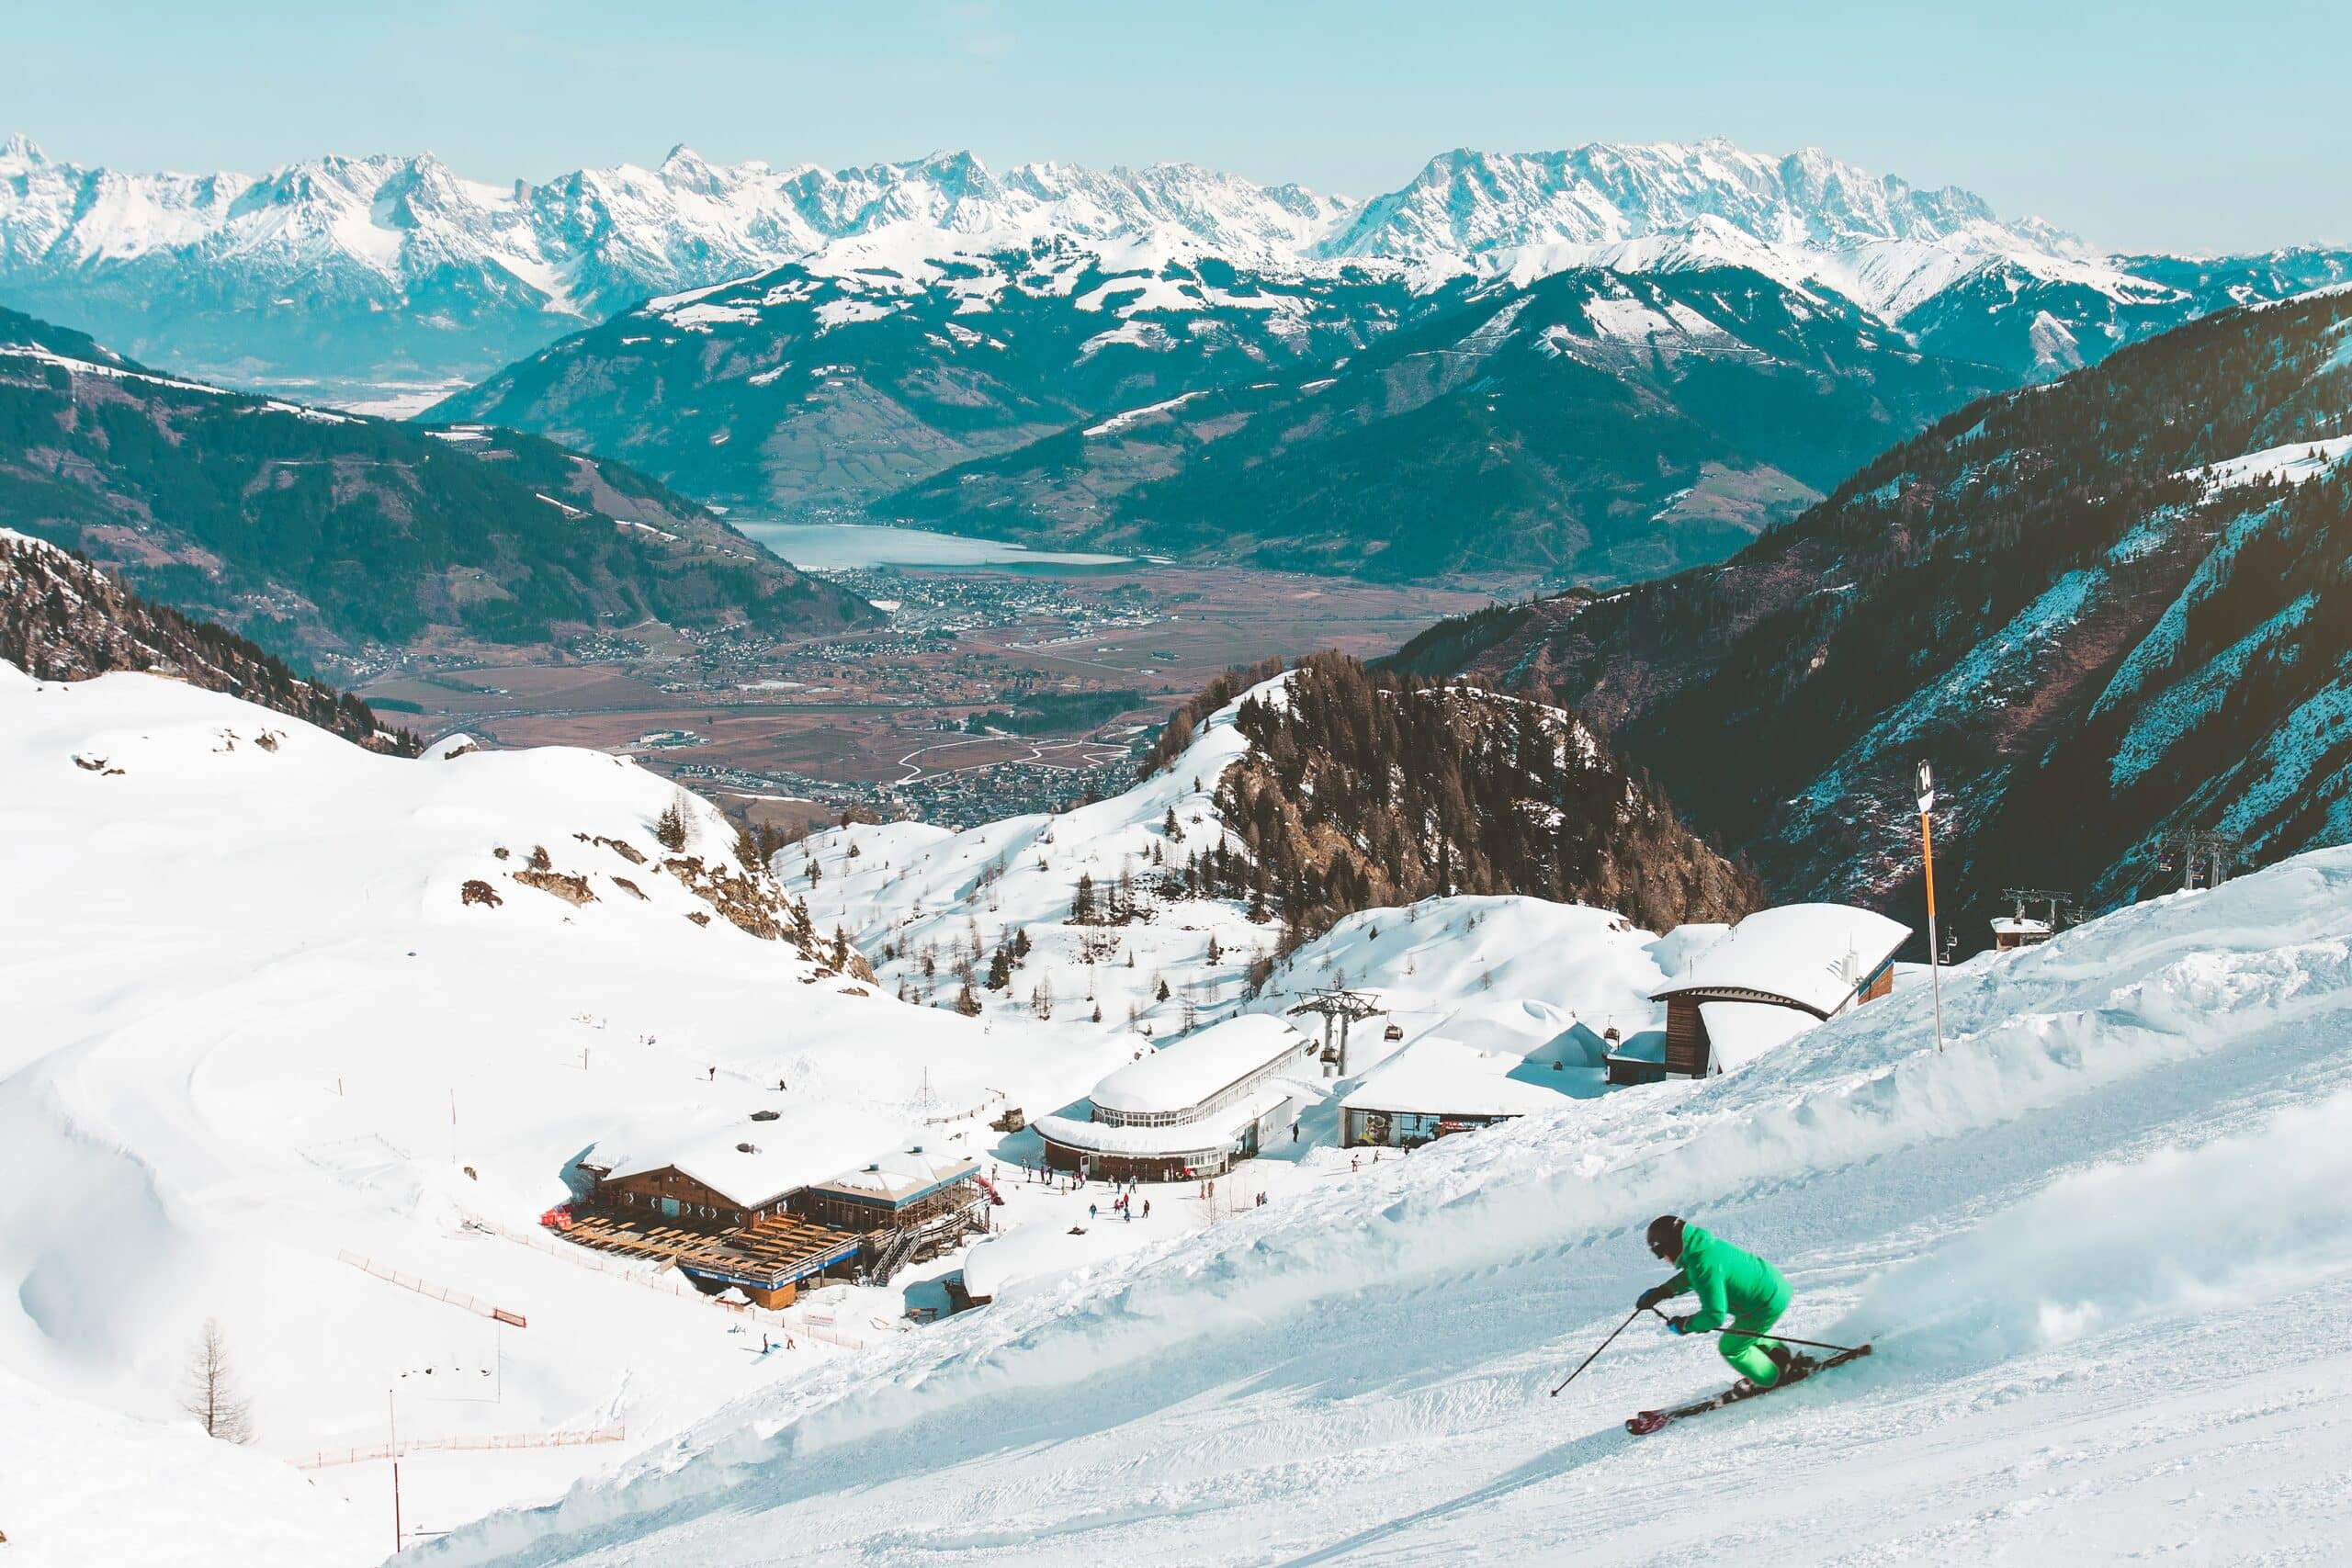 marriott ski resort